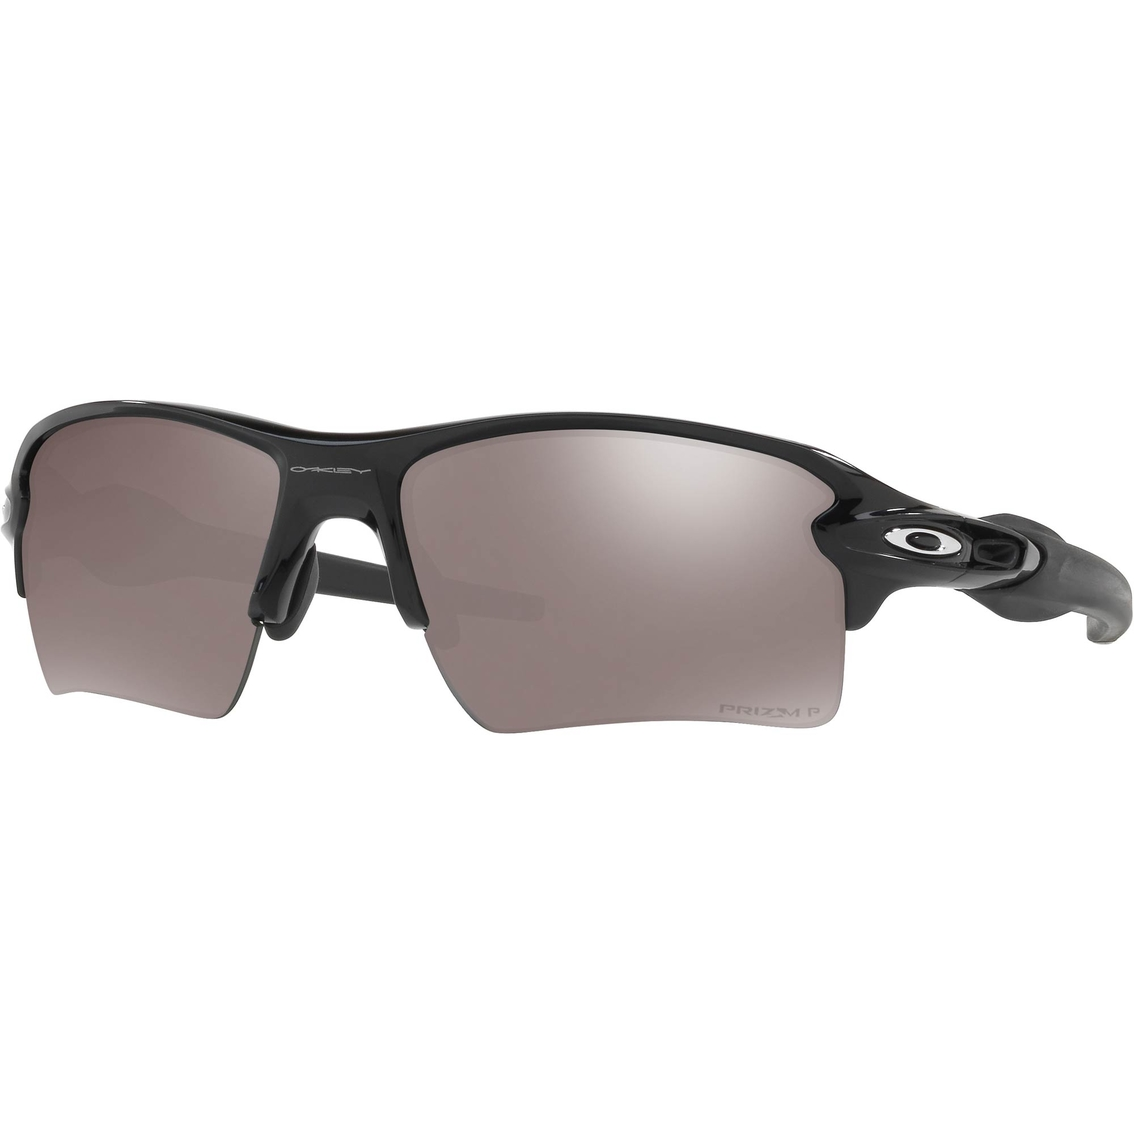 66d00eb9b0 Oakley Flak 2.0 Xl Matte Black prizm Daily Polarized Sunglasses 9188 ...